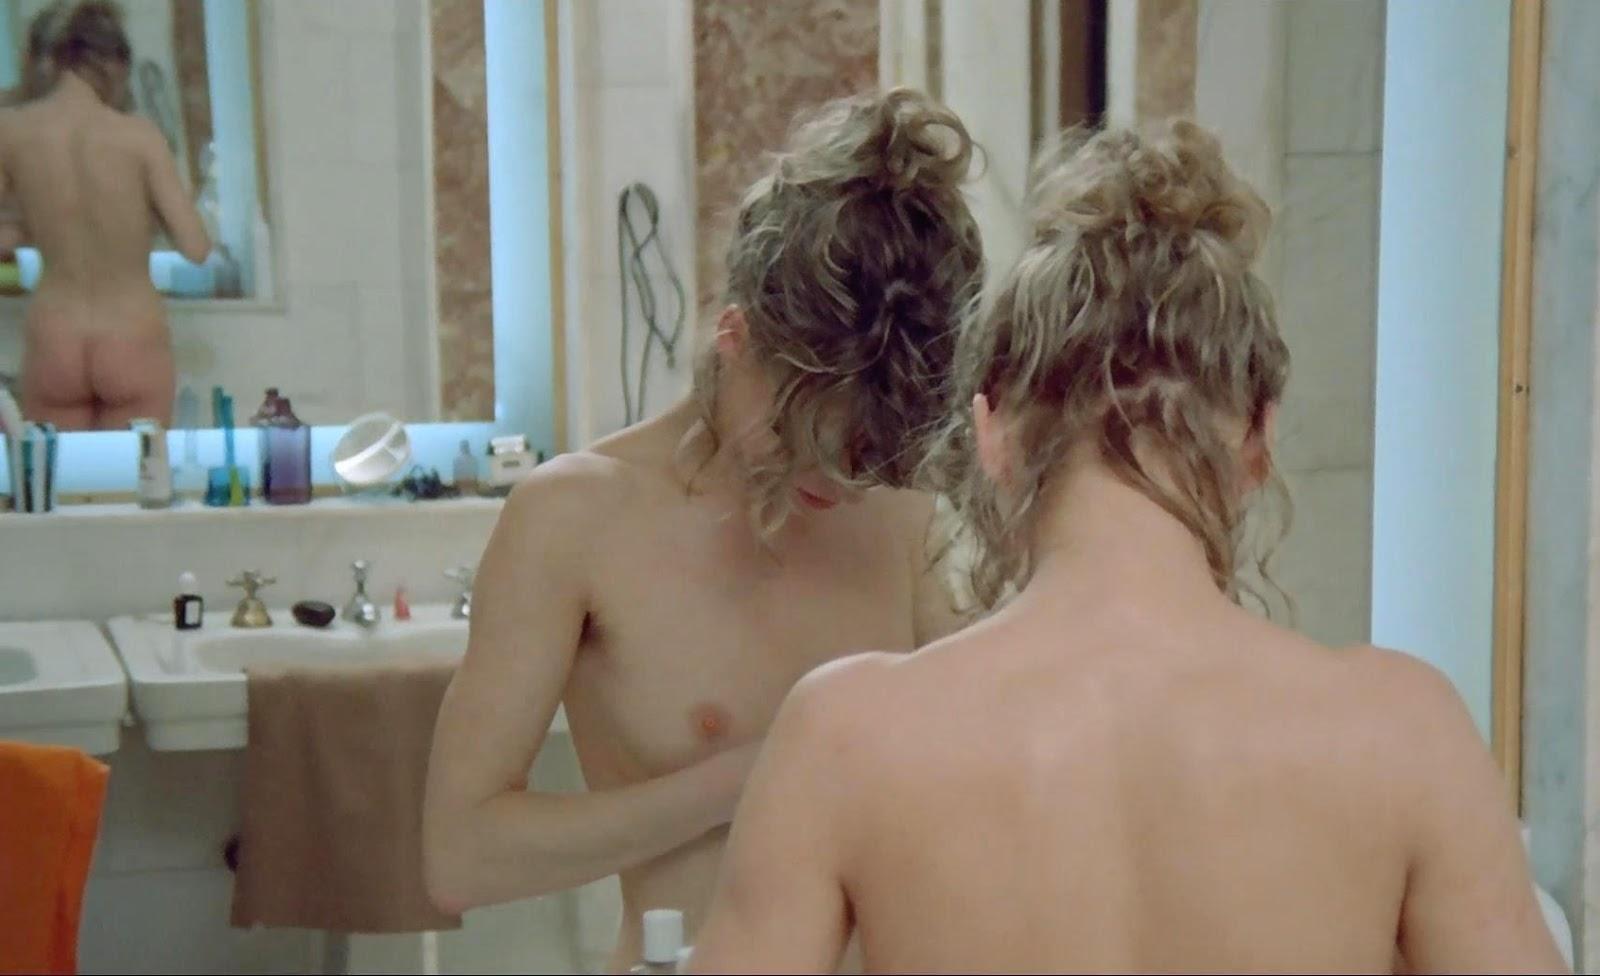 Emma de caunes actress french nude sexy tits - 1 part 7